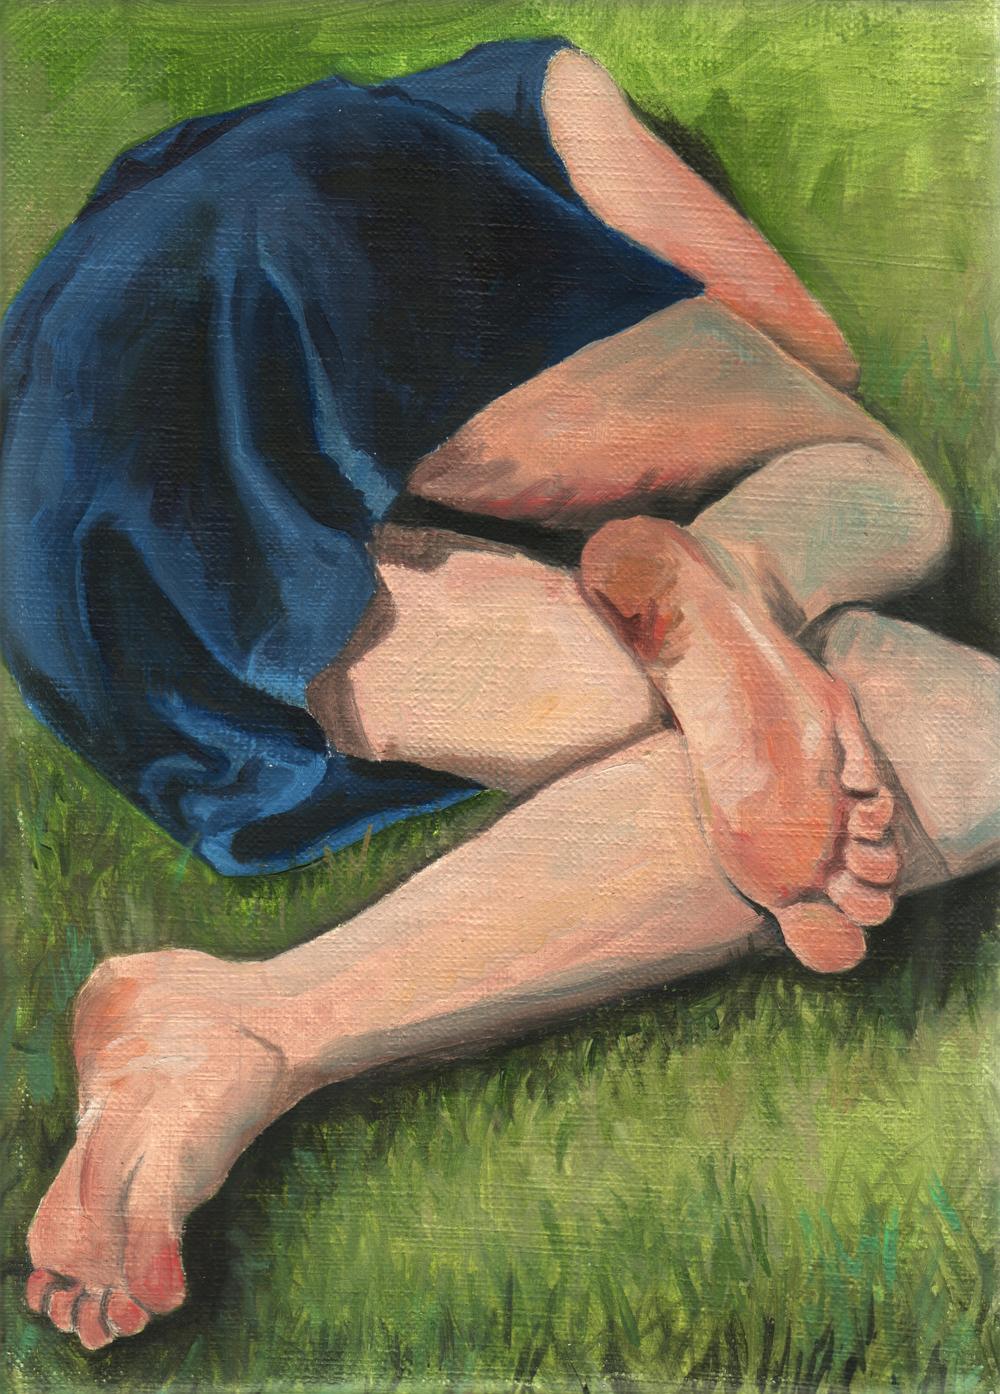 """Perv Painting III"" (series)"